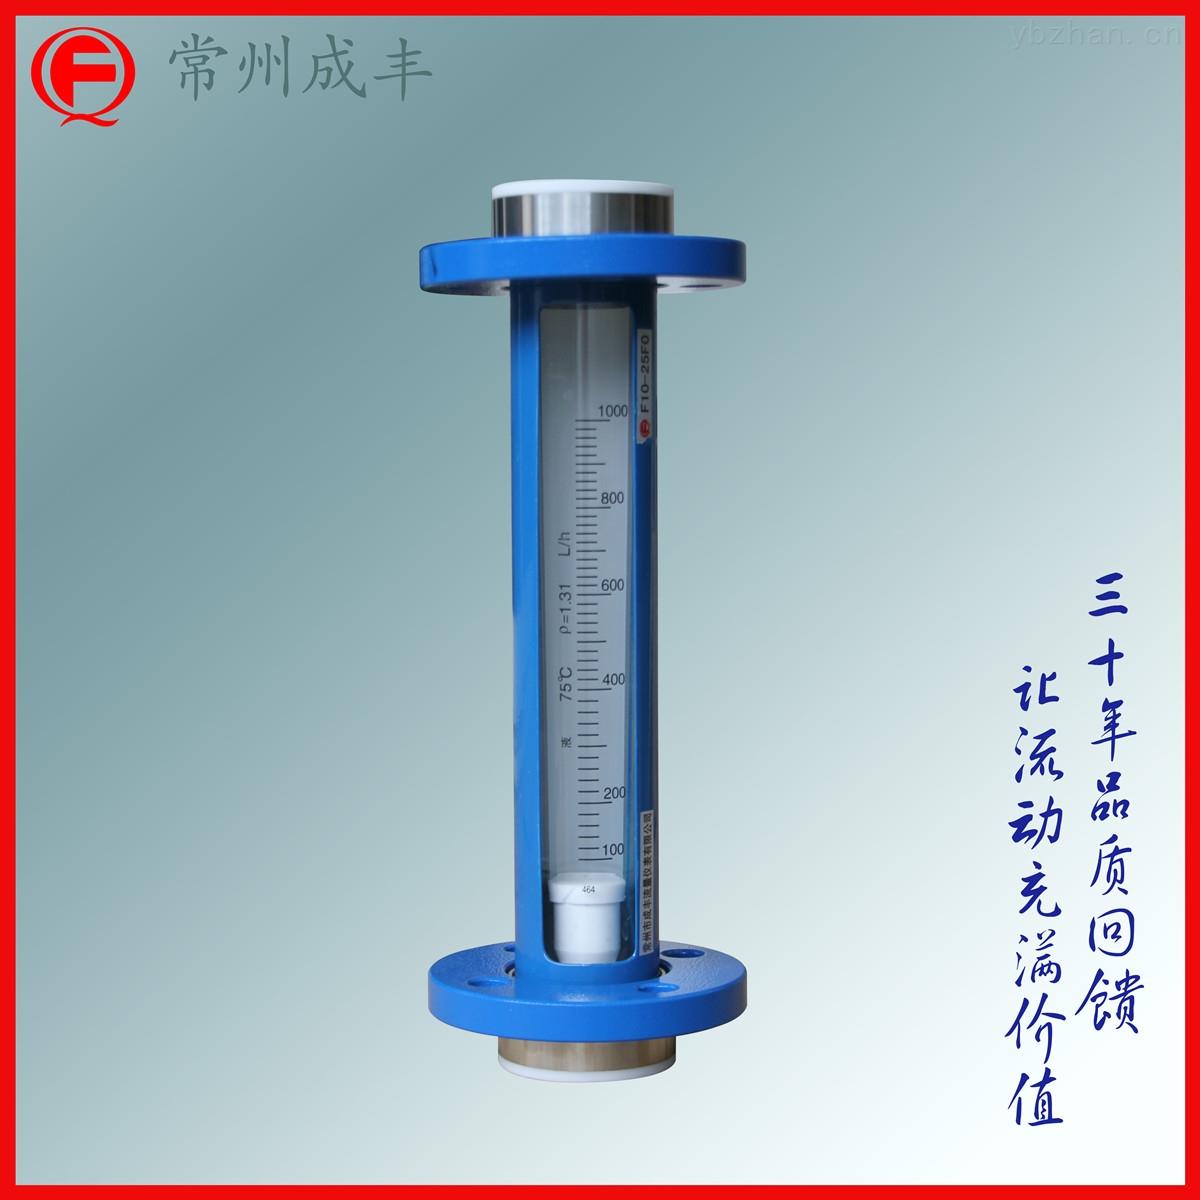 F10-25F0-盐酸玻璃转子流量计成丰仪表衬氟防腐品质好